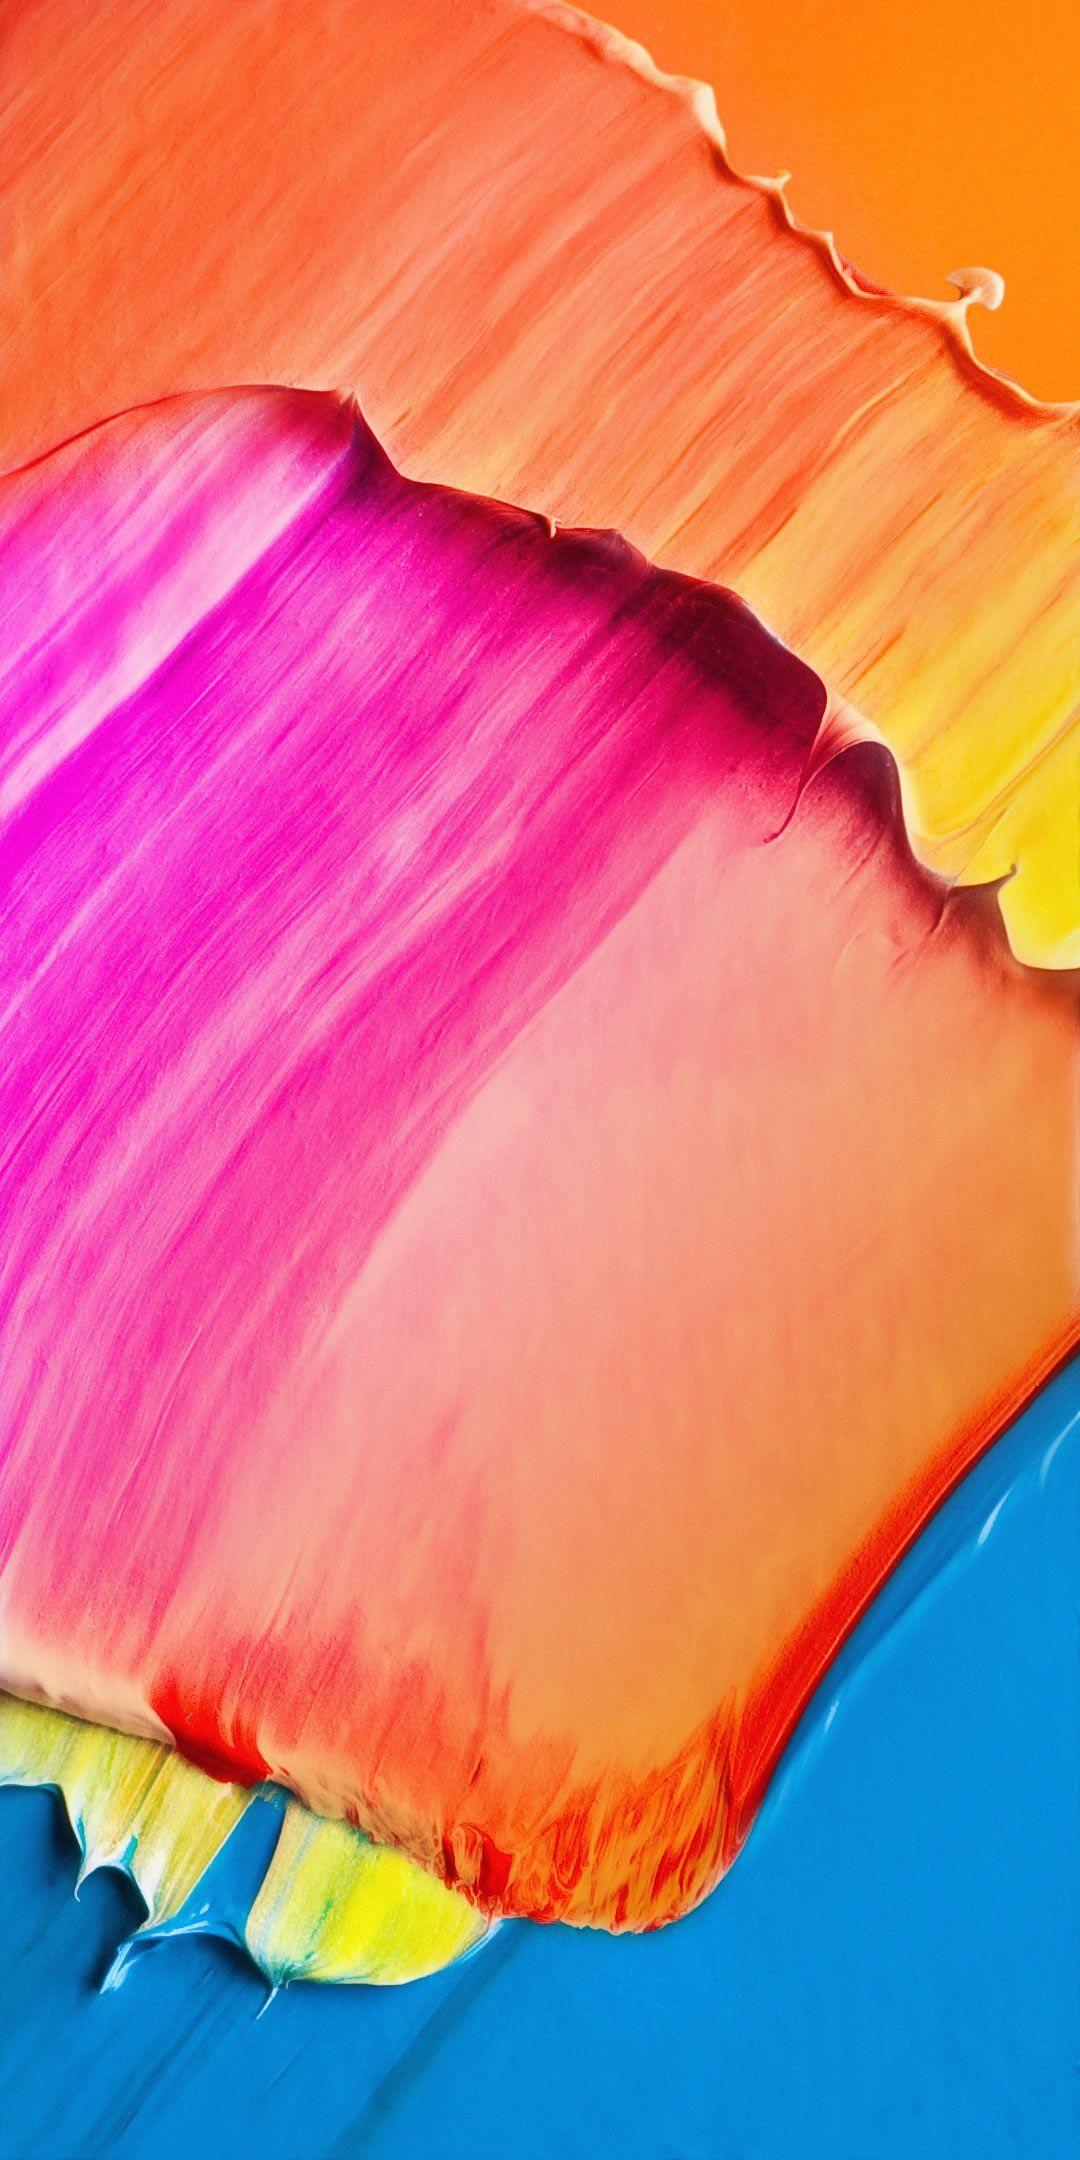 Nokia 125 Abstract Wallpaper 1080x2160 Xiaomi Wallpapers Samsung Wallpaper Iphone Wallpaper Hipster